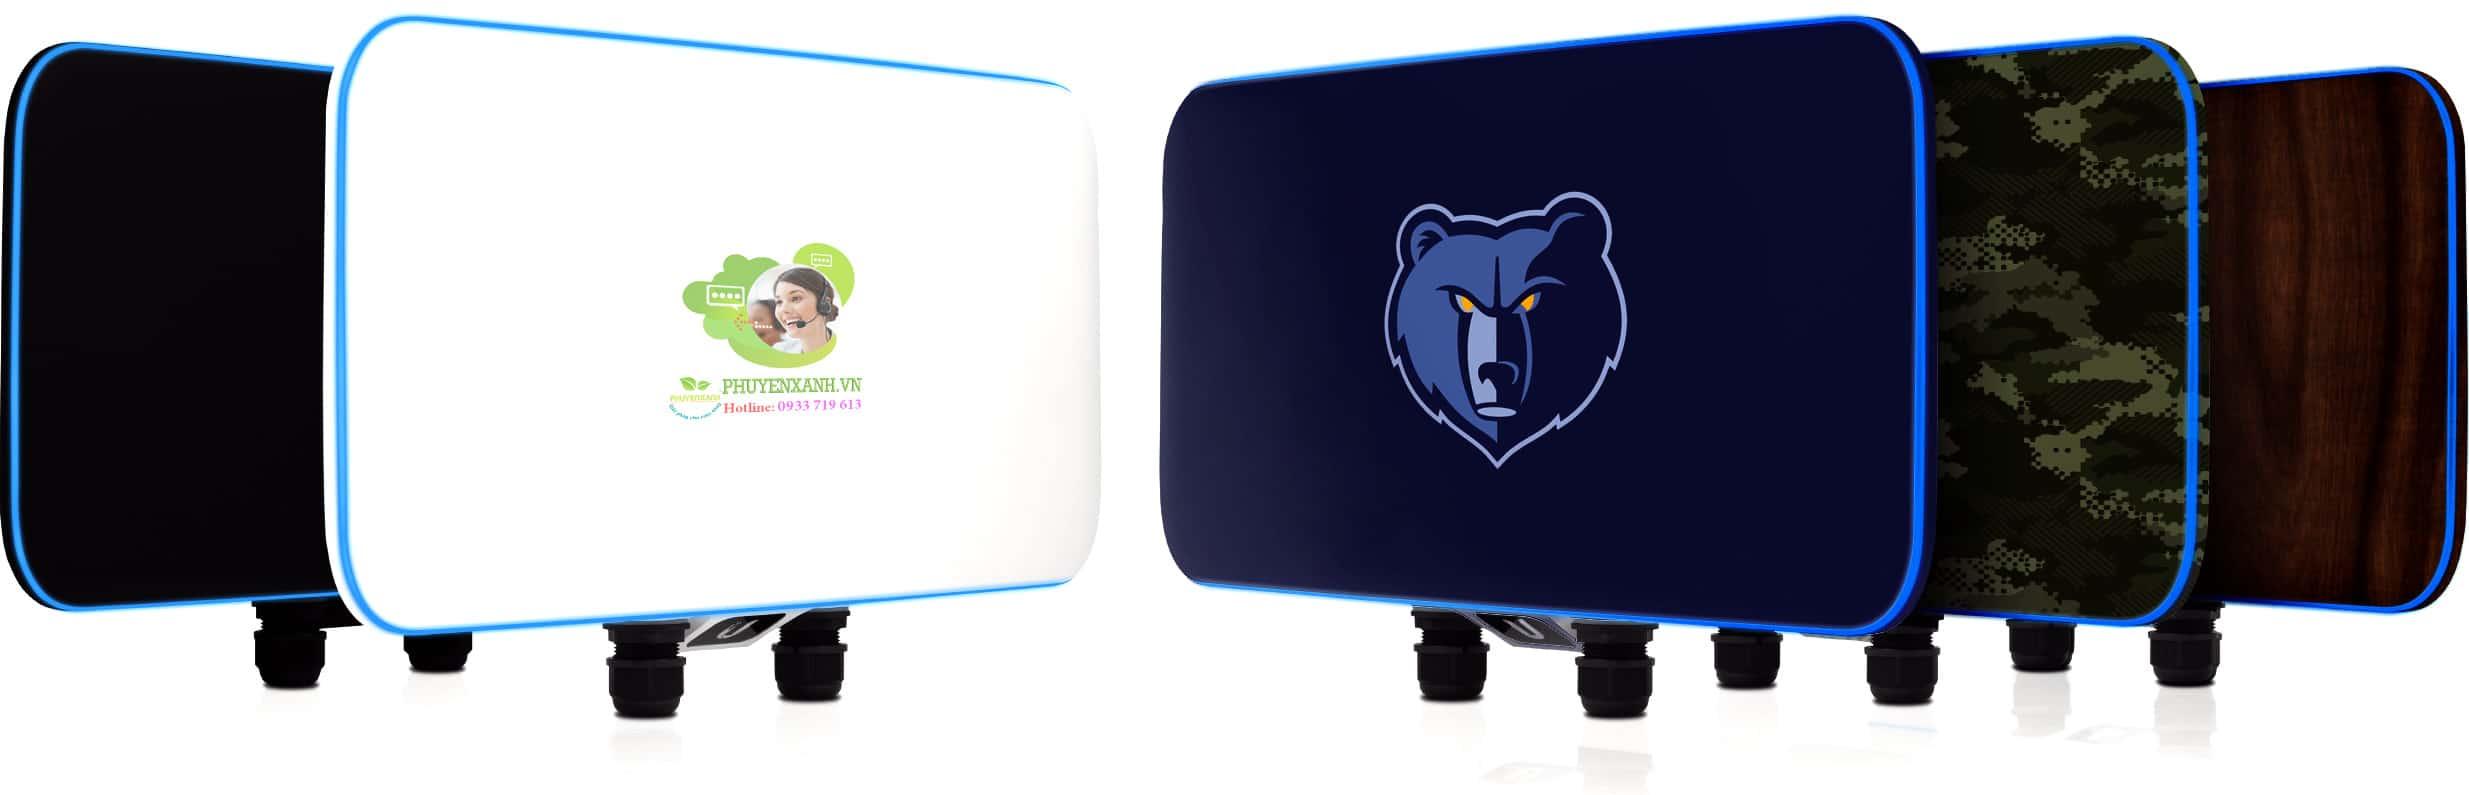 UniFi WiFi BaseStation XG thiet ke Cong nghiep